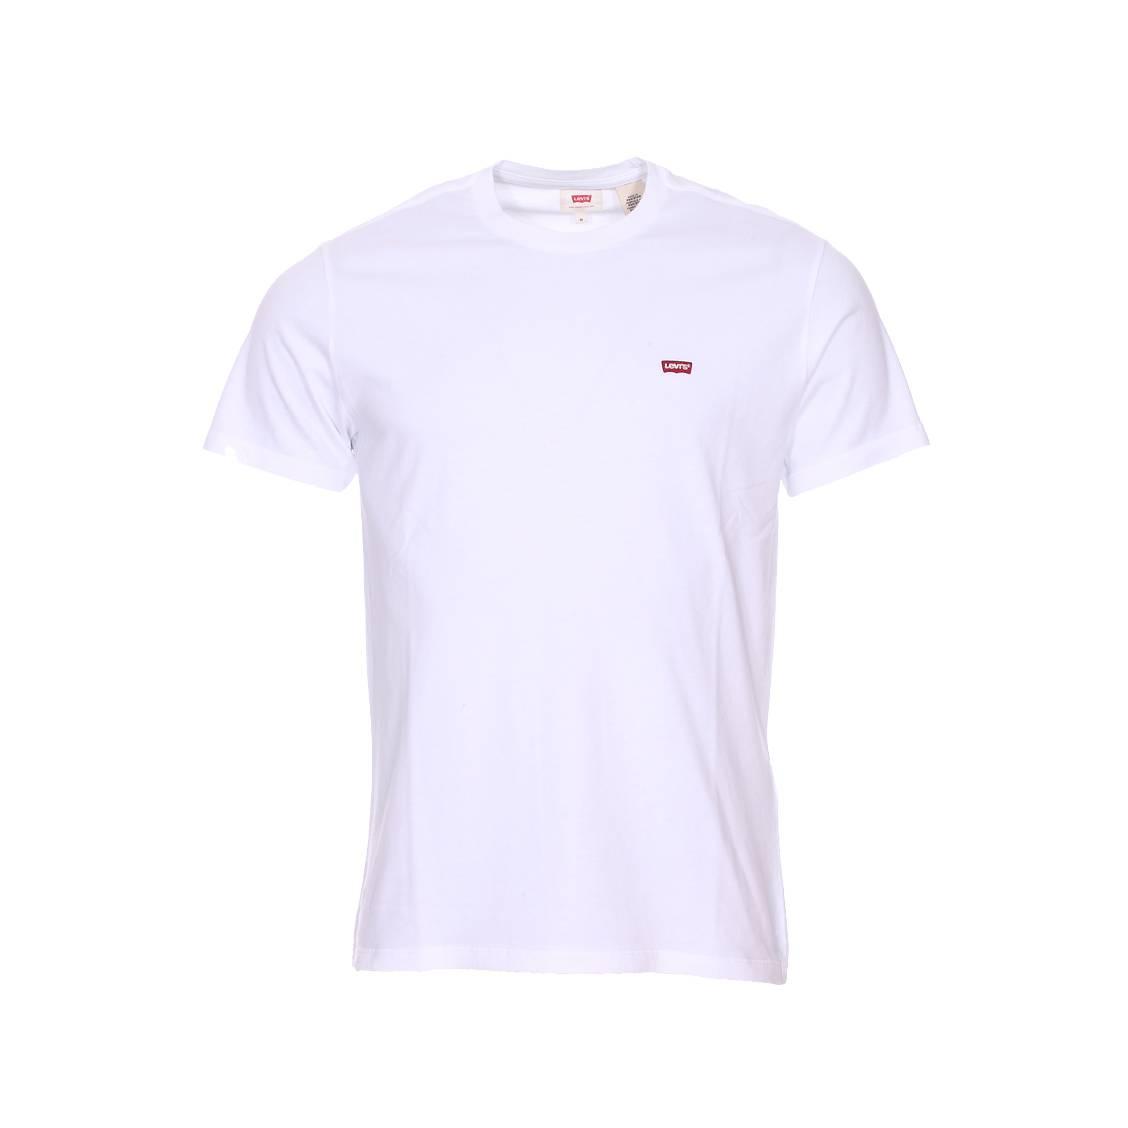 tee shirt col rond levi 39 s original en coton blanc rue. Black Bedroom Furniture Sets. Home Design Ideas